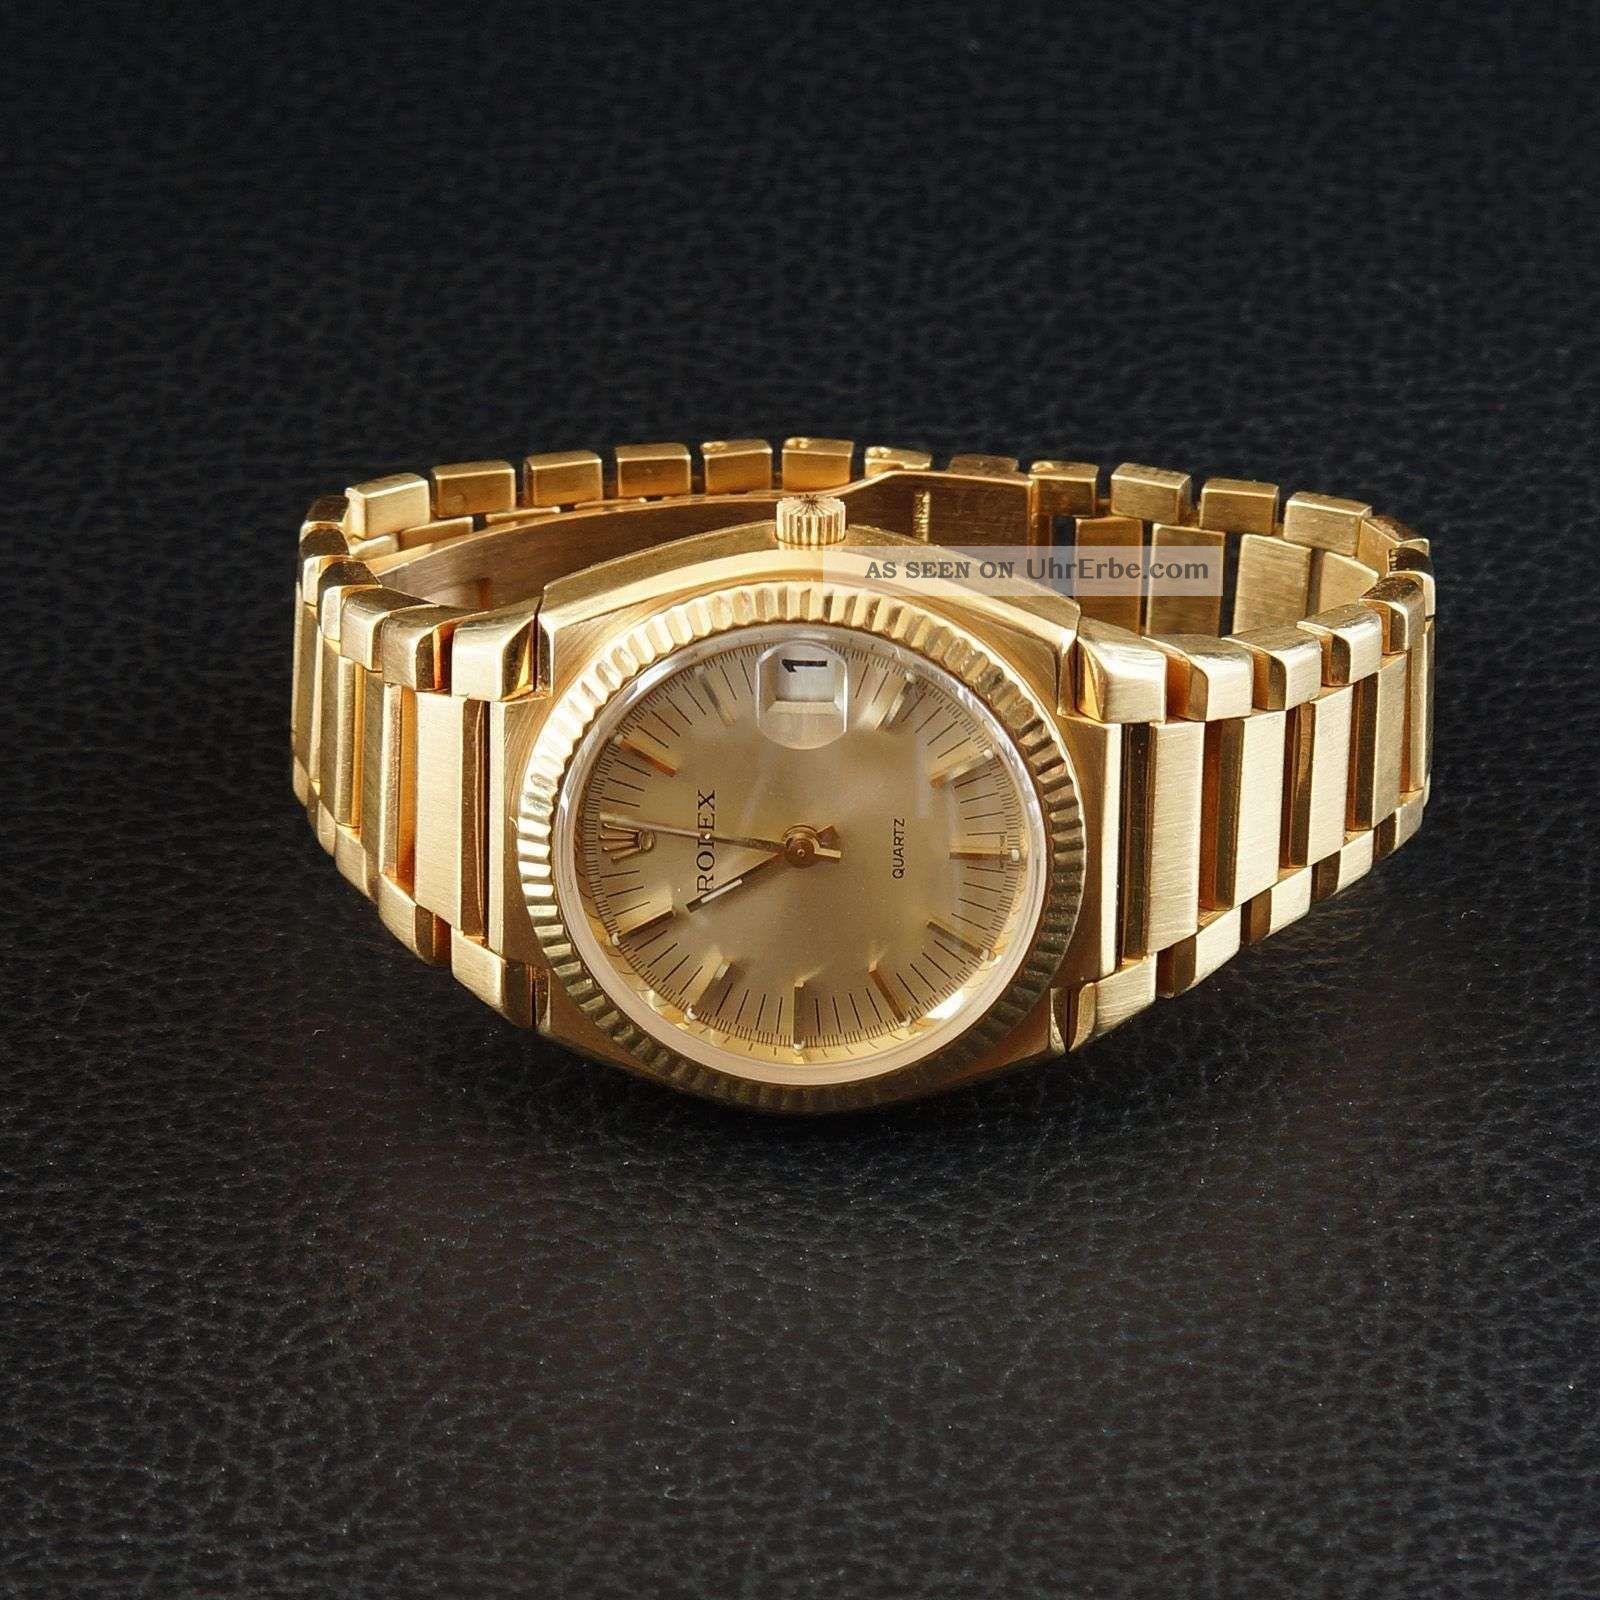 Sehr Seltene Rolex Beta - Quarz Gelbgold Armbanduhren Bild